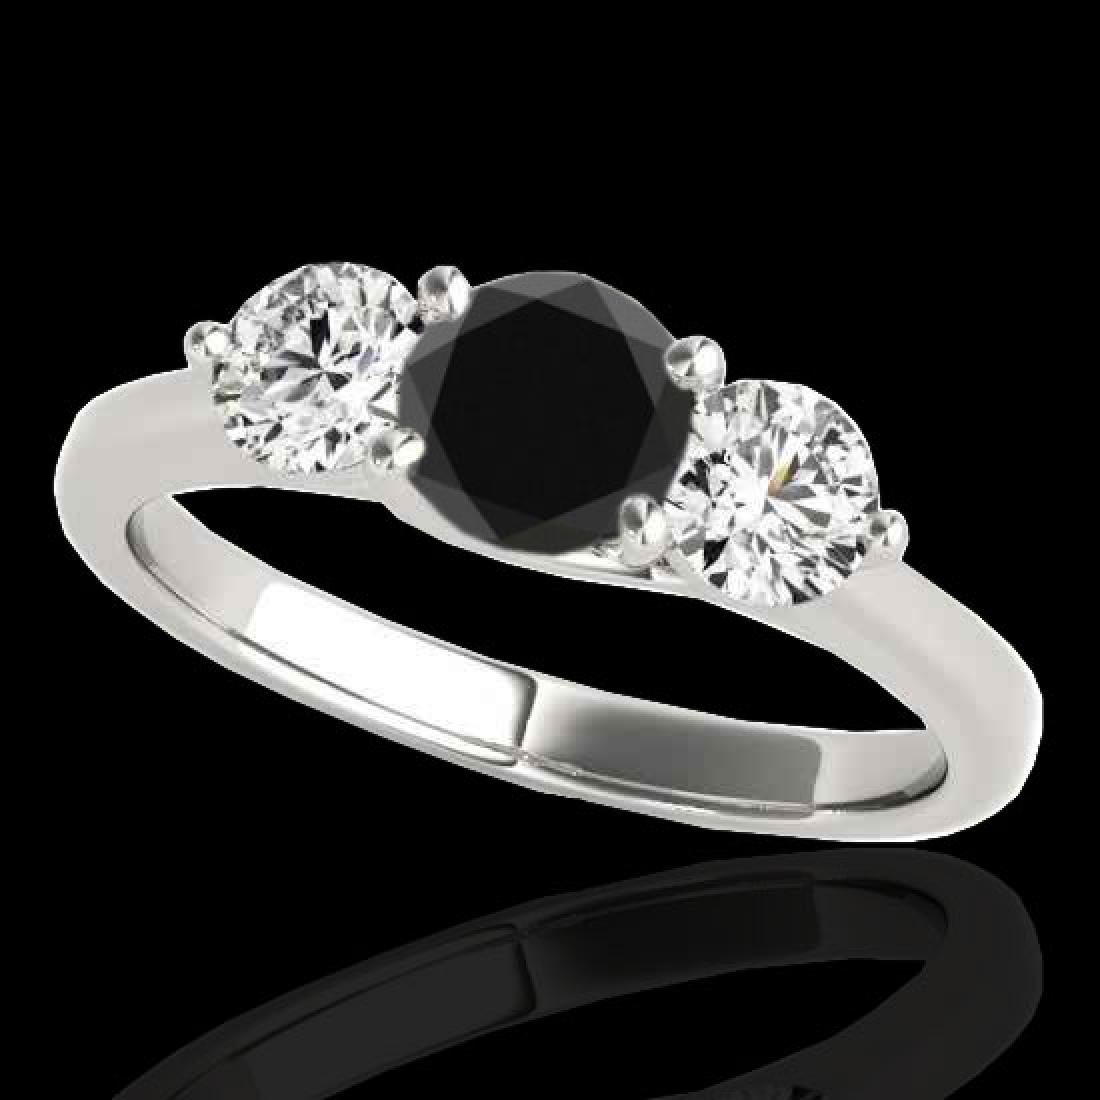 3 CTW Certified VS Black Diamond 3 Stone Solitaire Ring